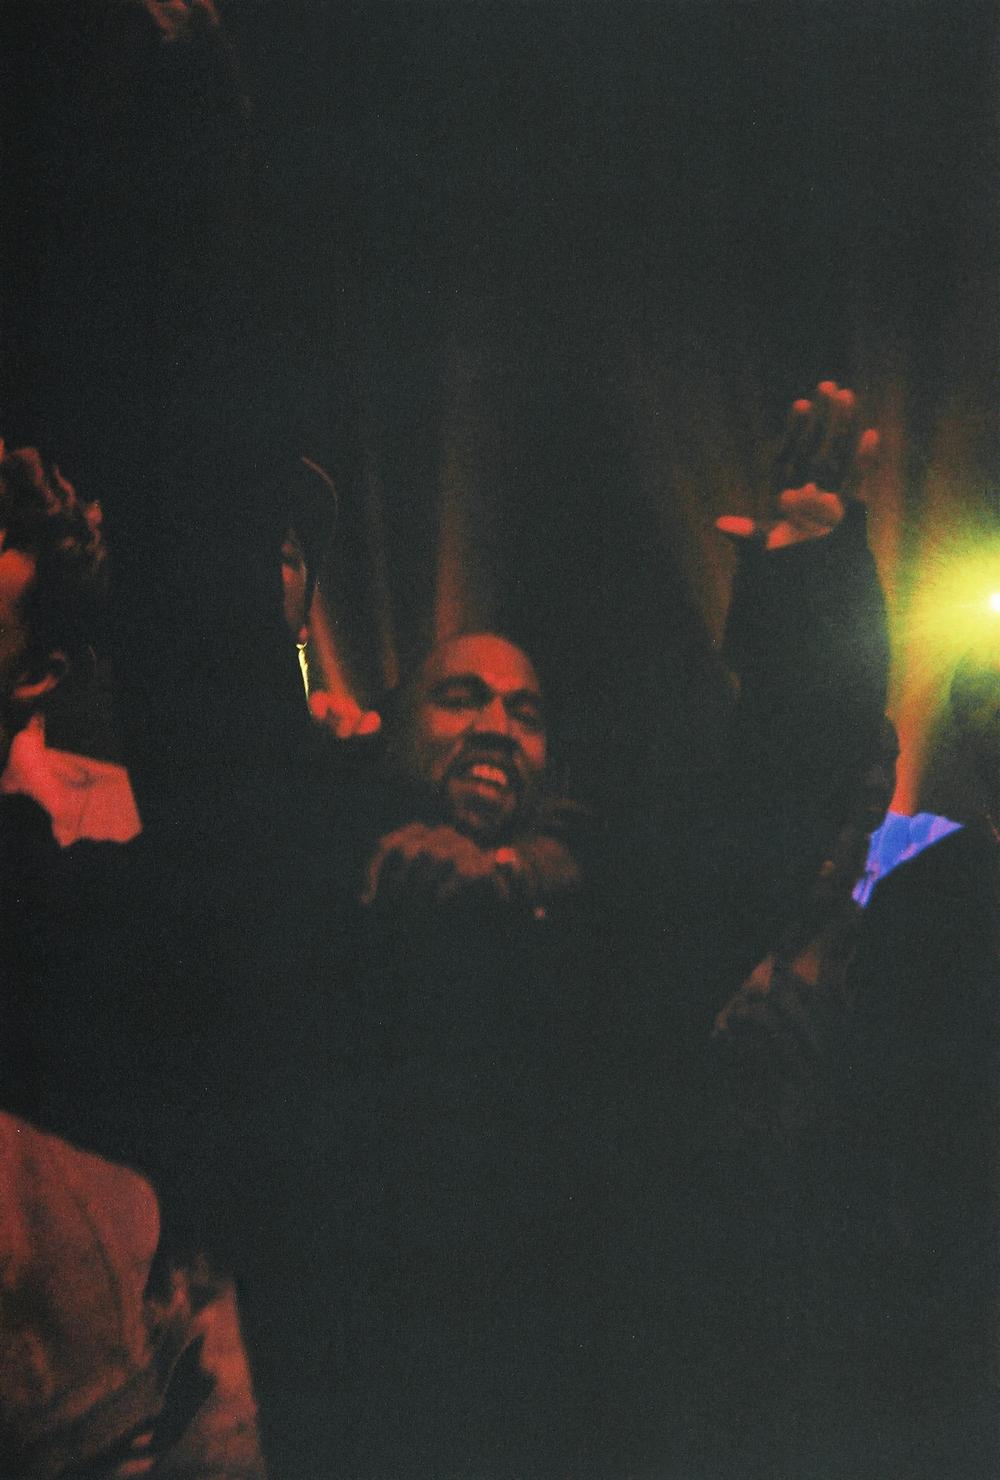 casenruiz.com-film-kanye-west-5.jpg